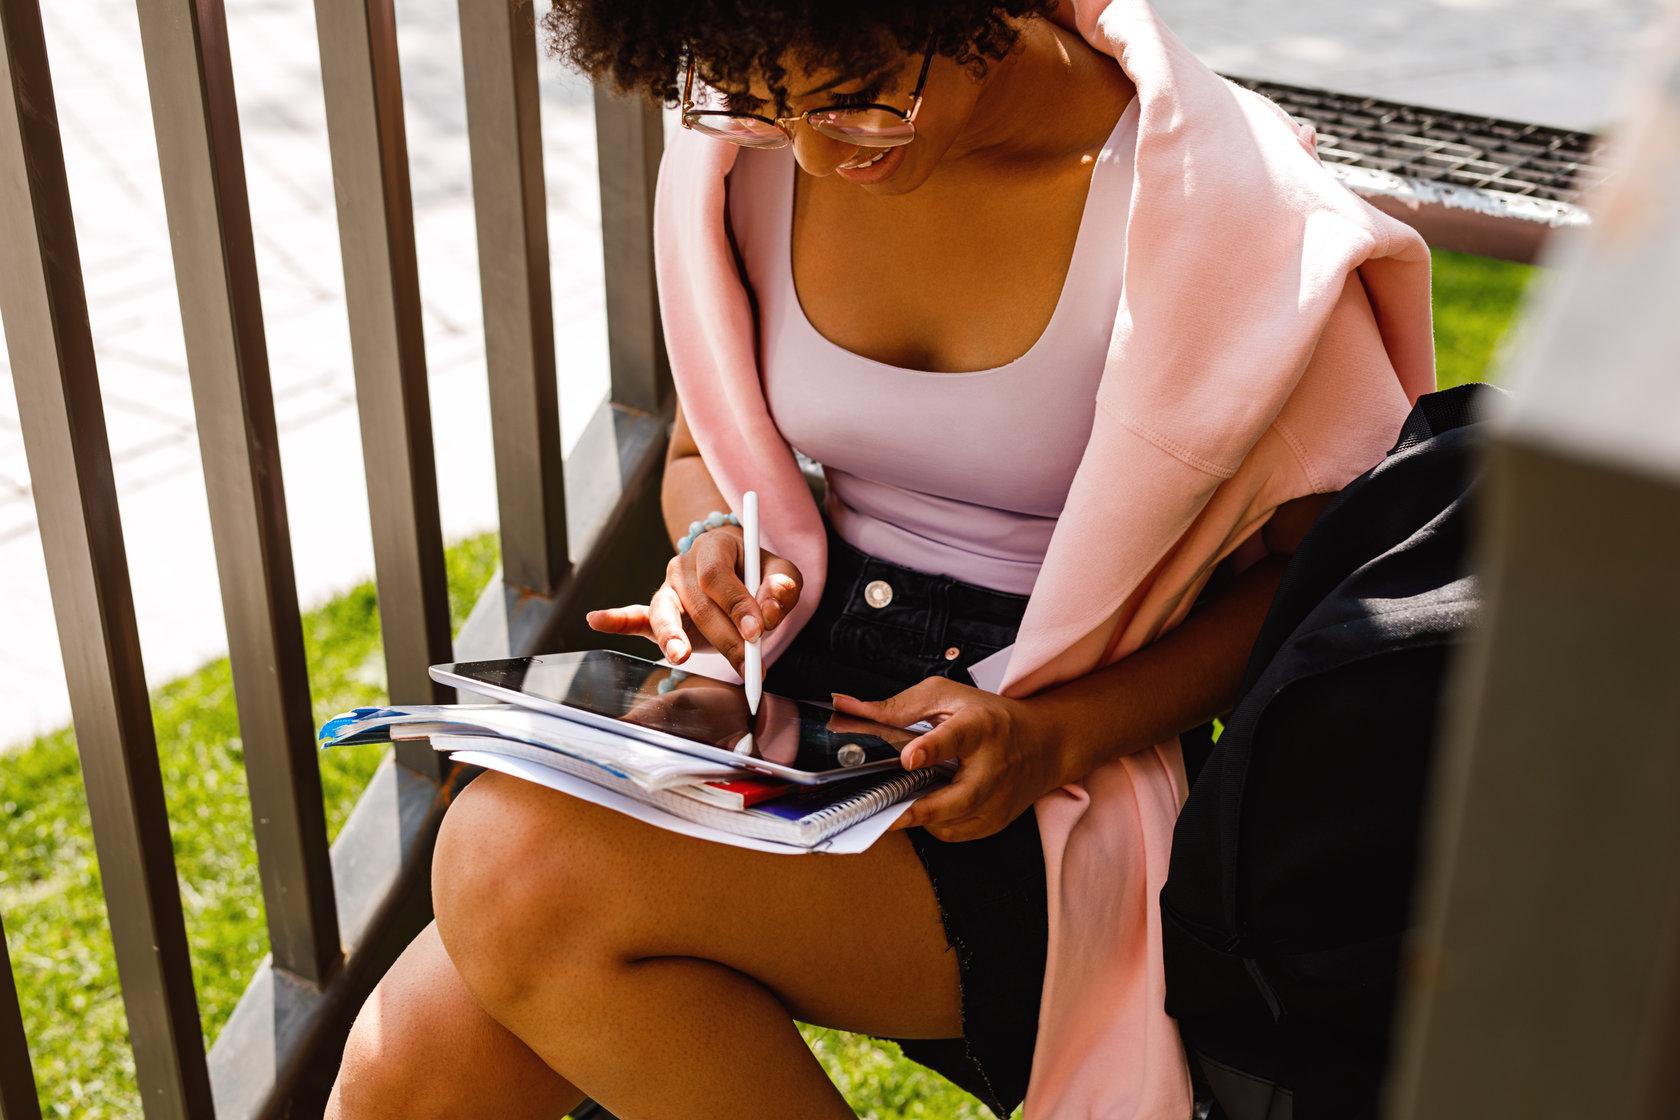 rsz_canva_-_woman_using_a_tablet.jpg